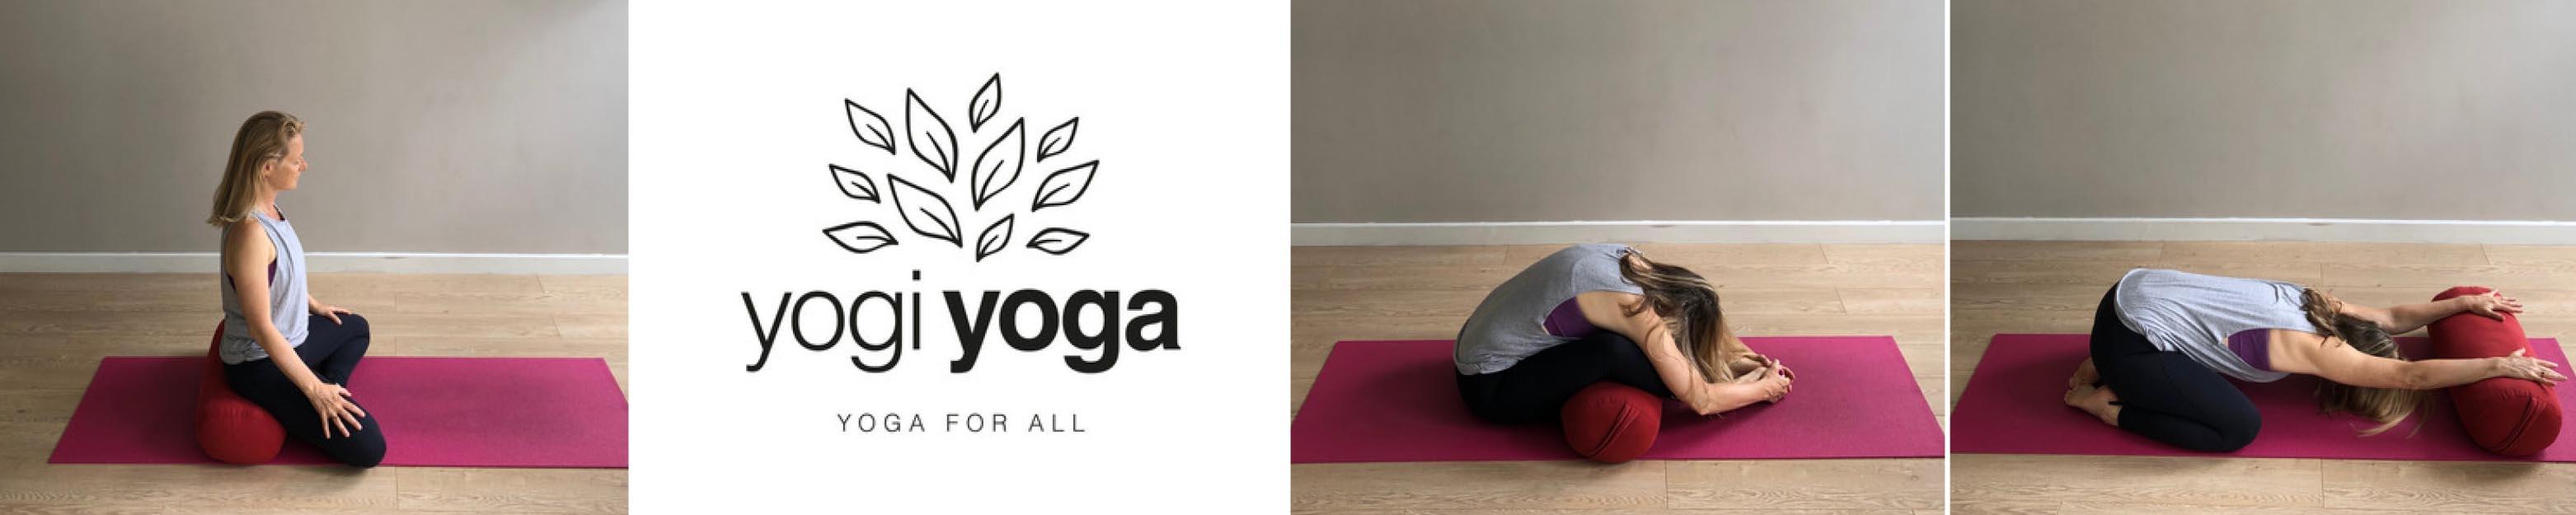 Restorative yin & mindfulness yogiyoga